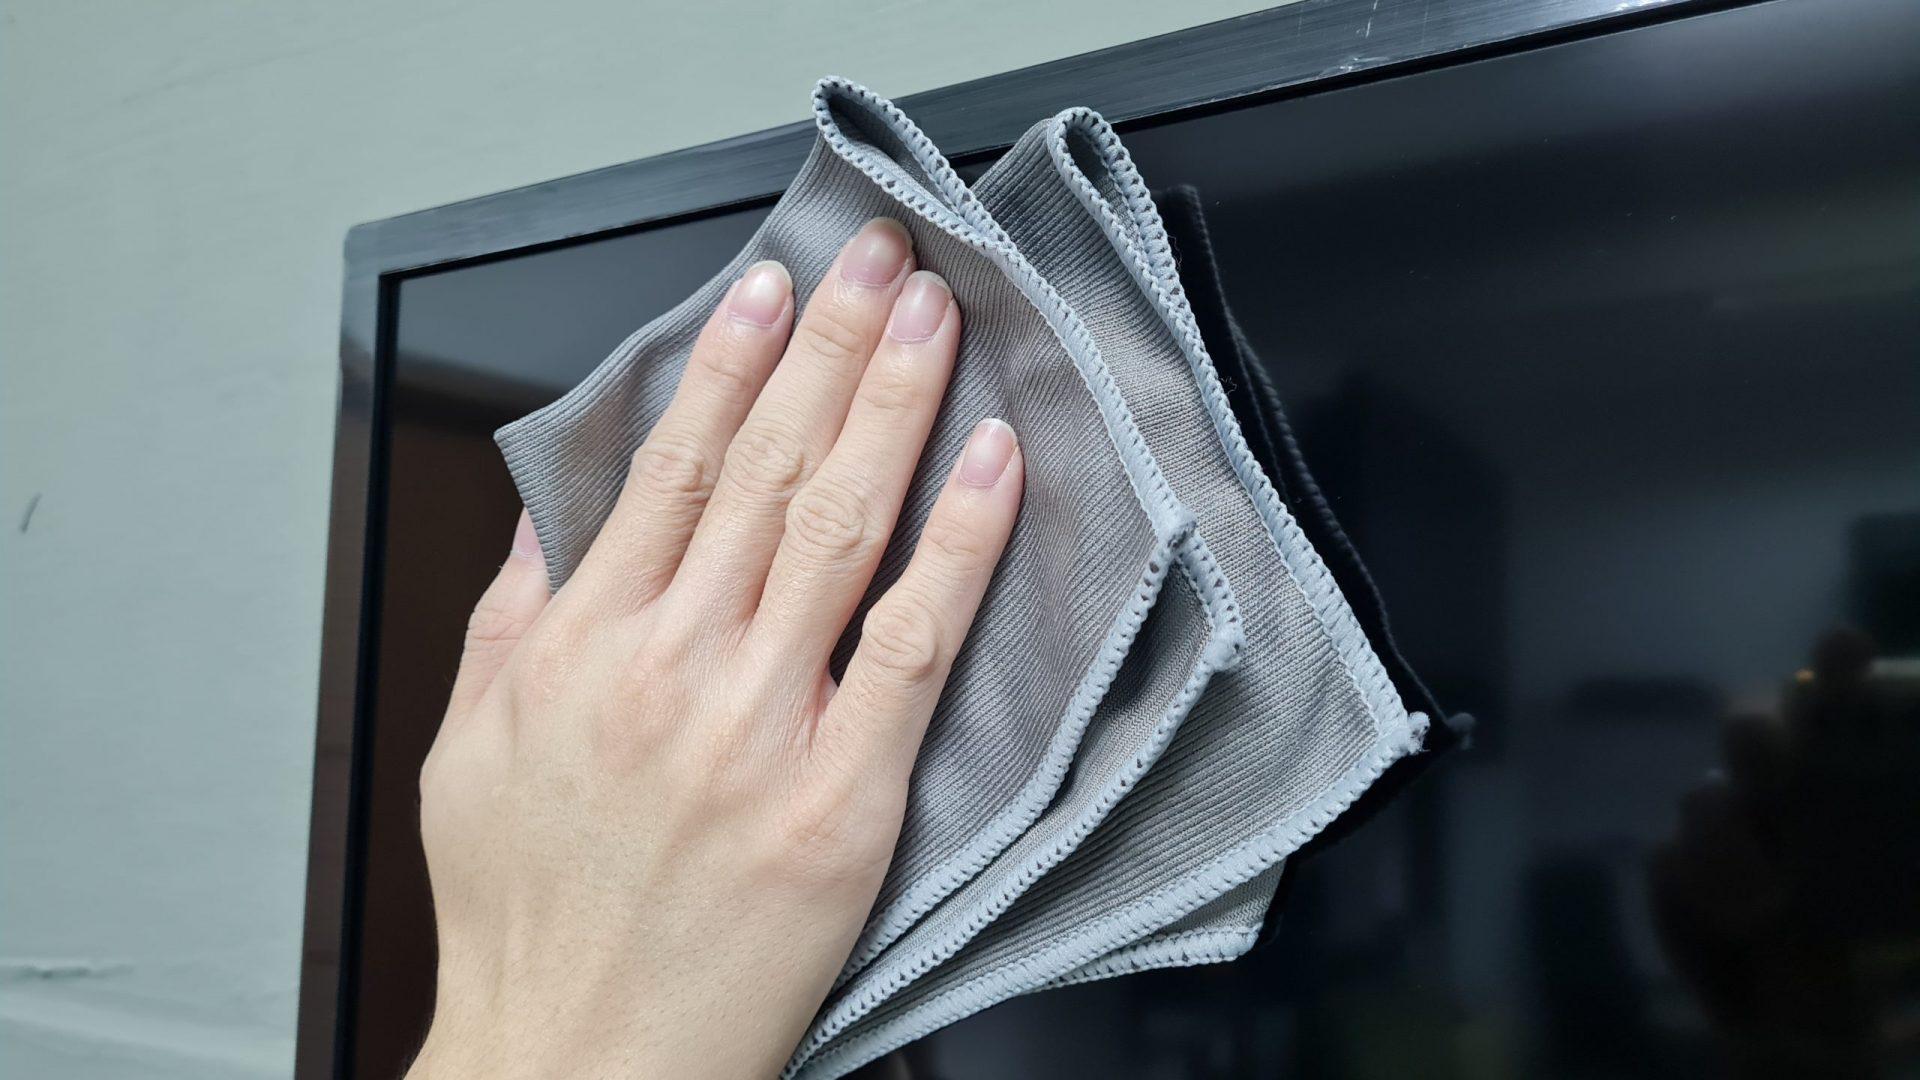 How to clean TV screen scaled p8q9uldh8tqjv2rhbniprd8purviczytdjktgi0x80 - How To Clean TV Screen